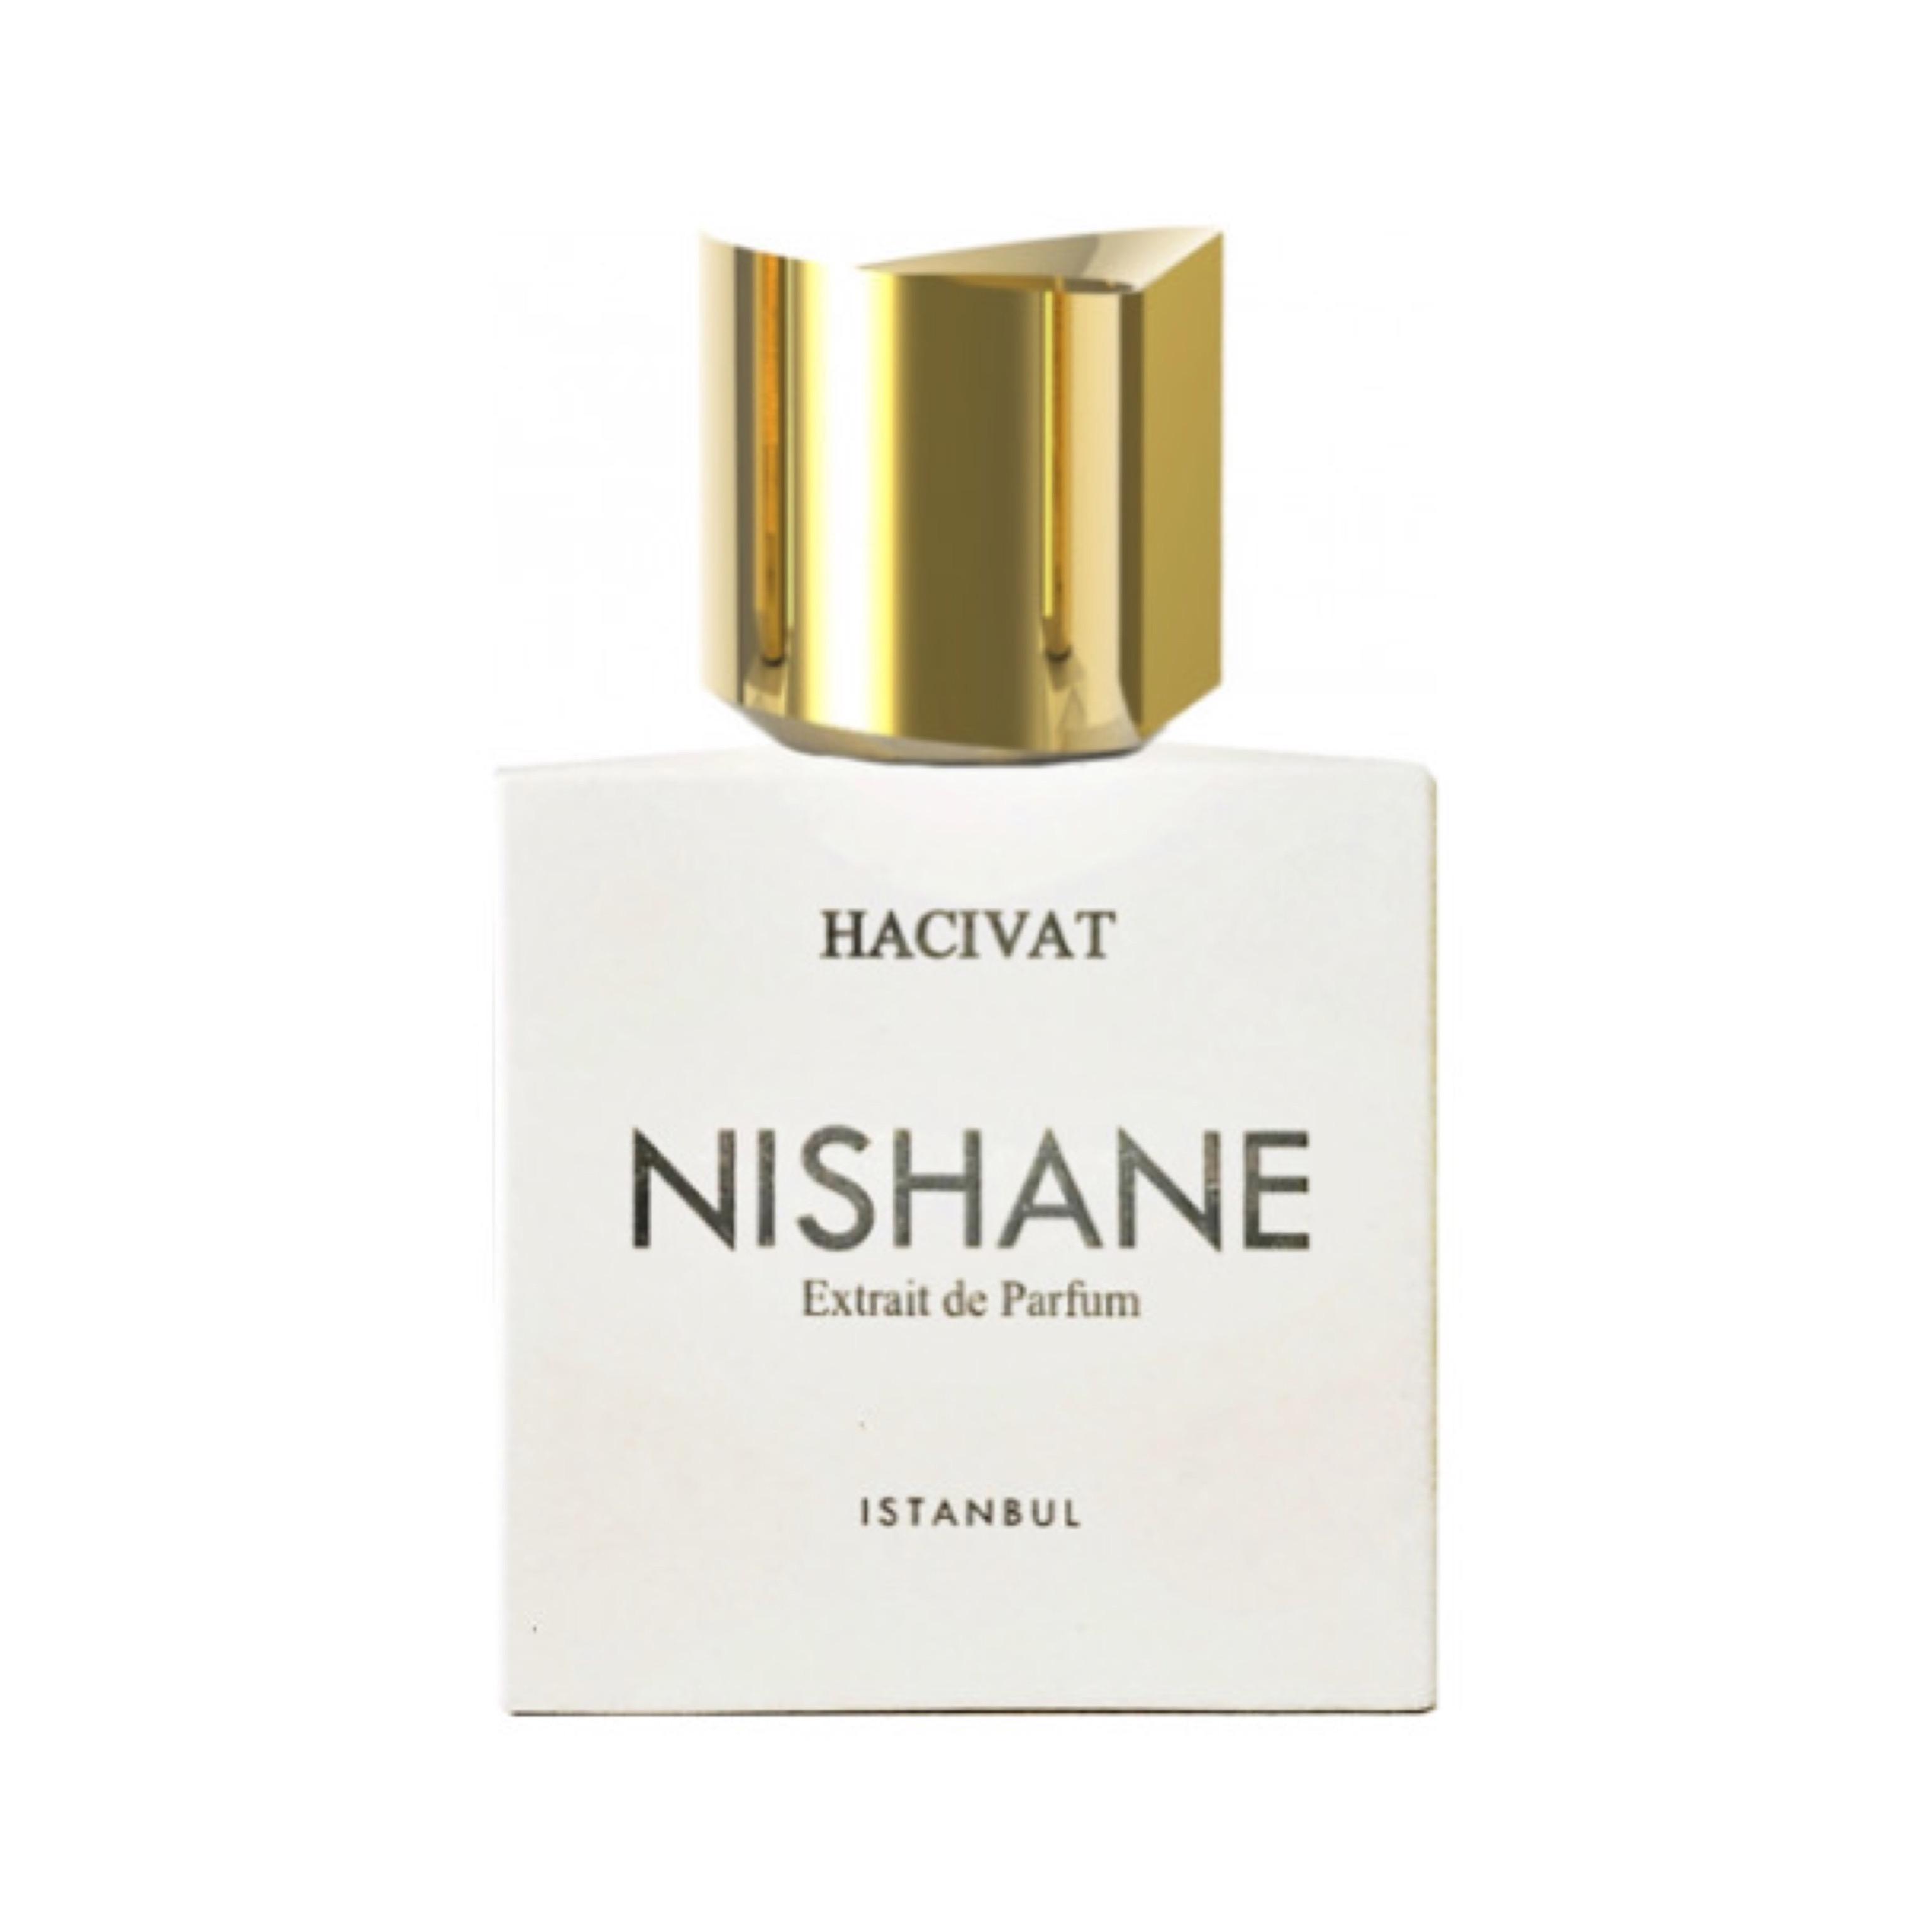 NISHANE-Hacivat ExdP